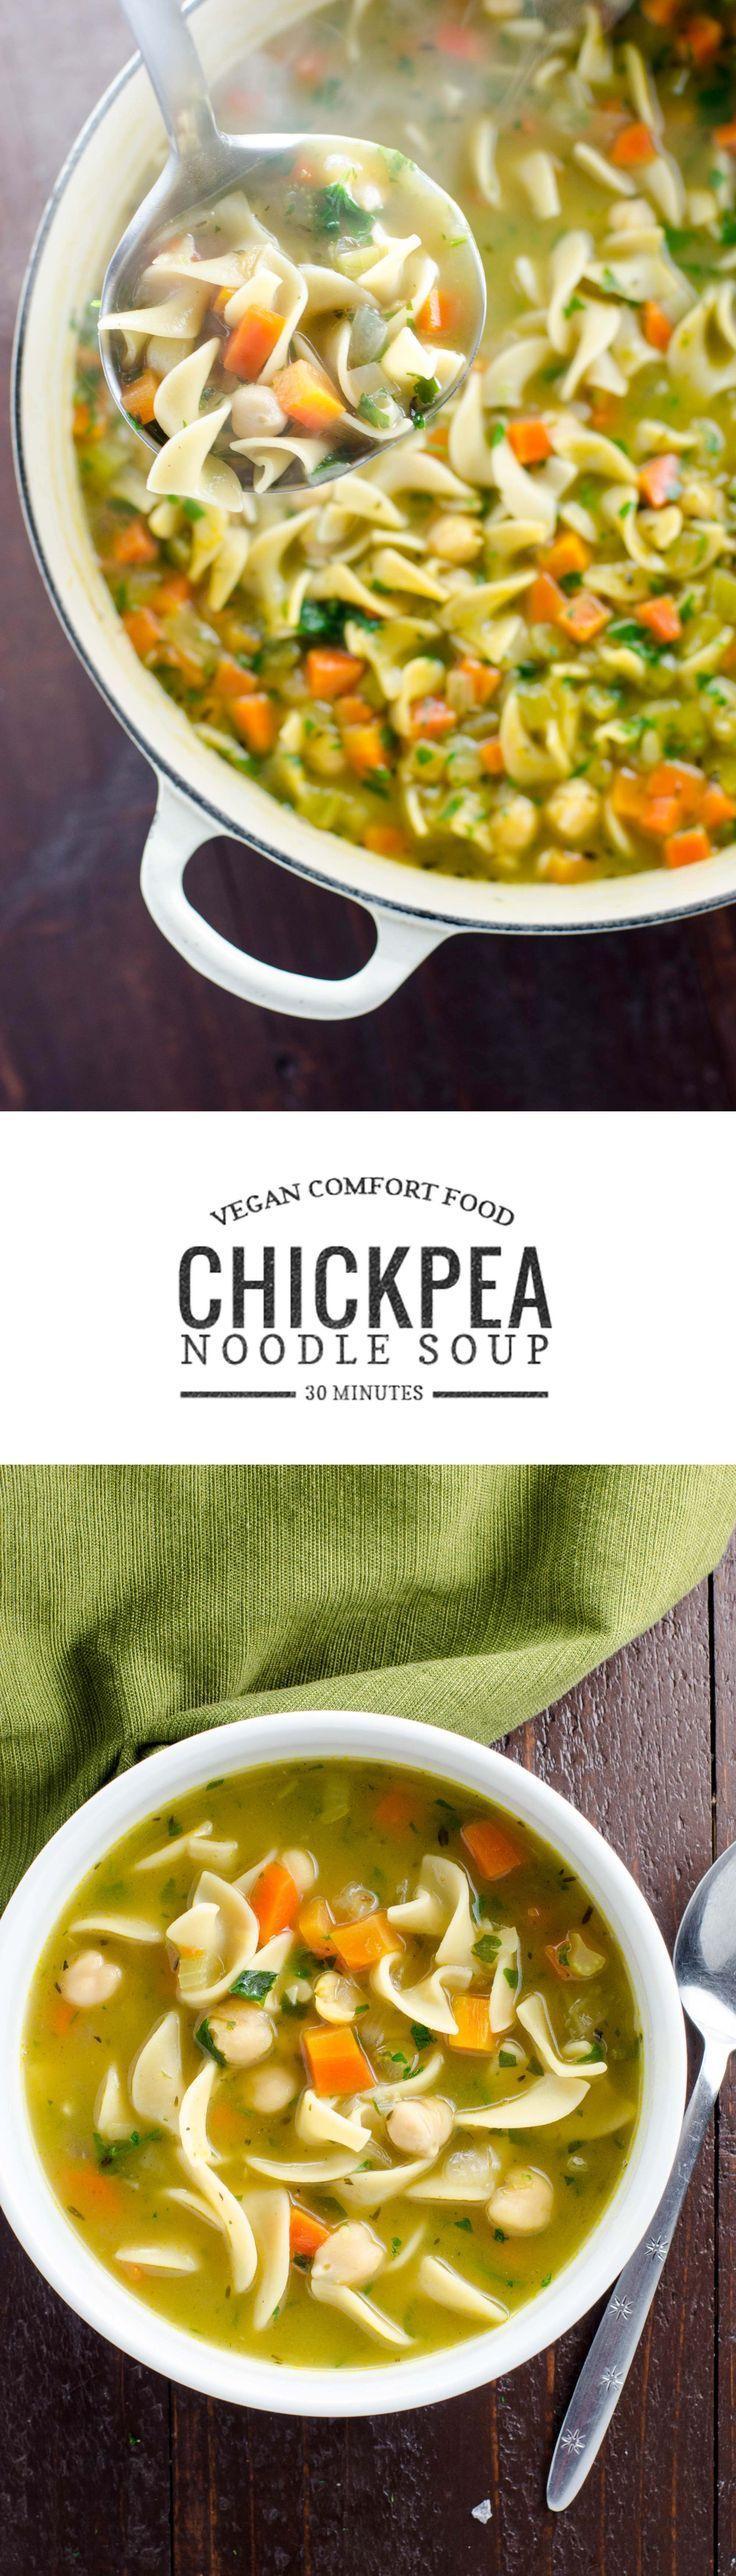 327 best vegan comfort food images on pinterest vegan meals chickpea noodle soup is vegan comfort food at its finest warming easy to make forumfinder Gallery